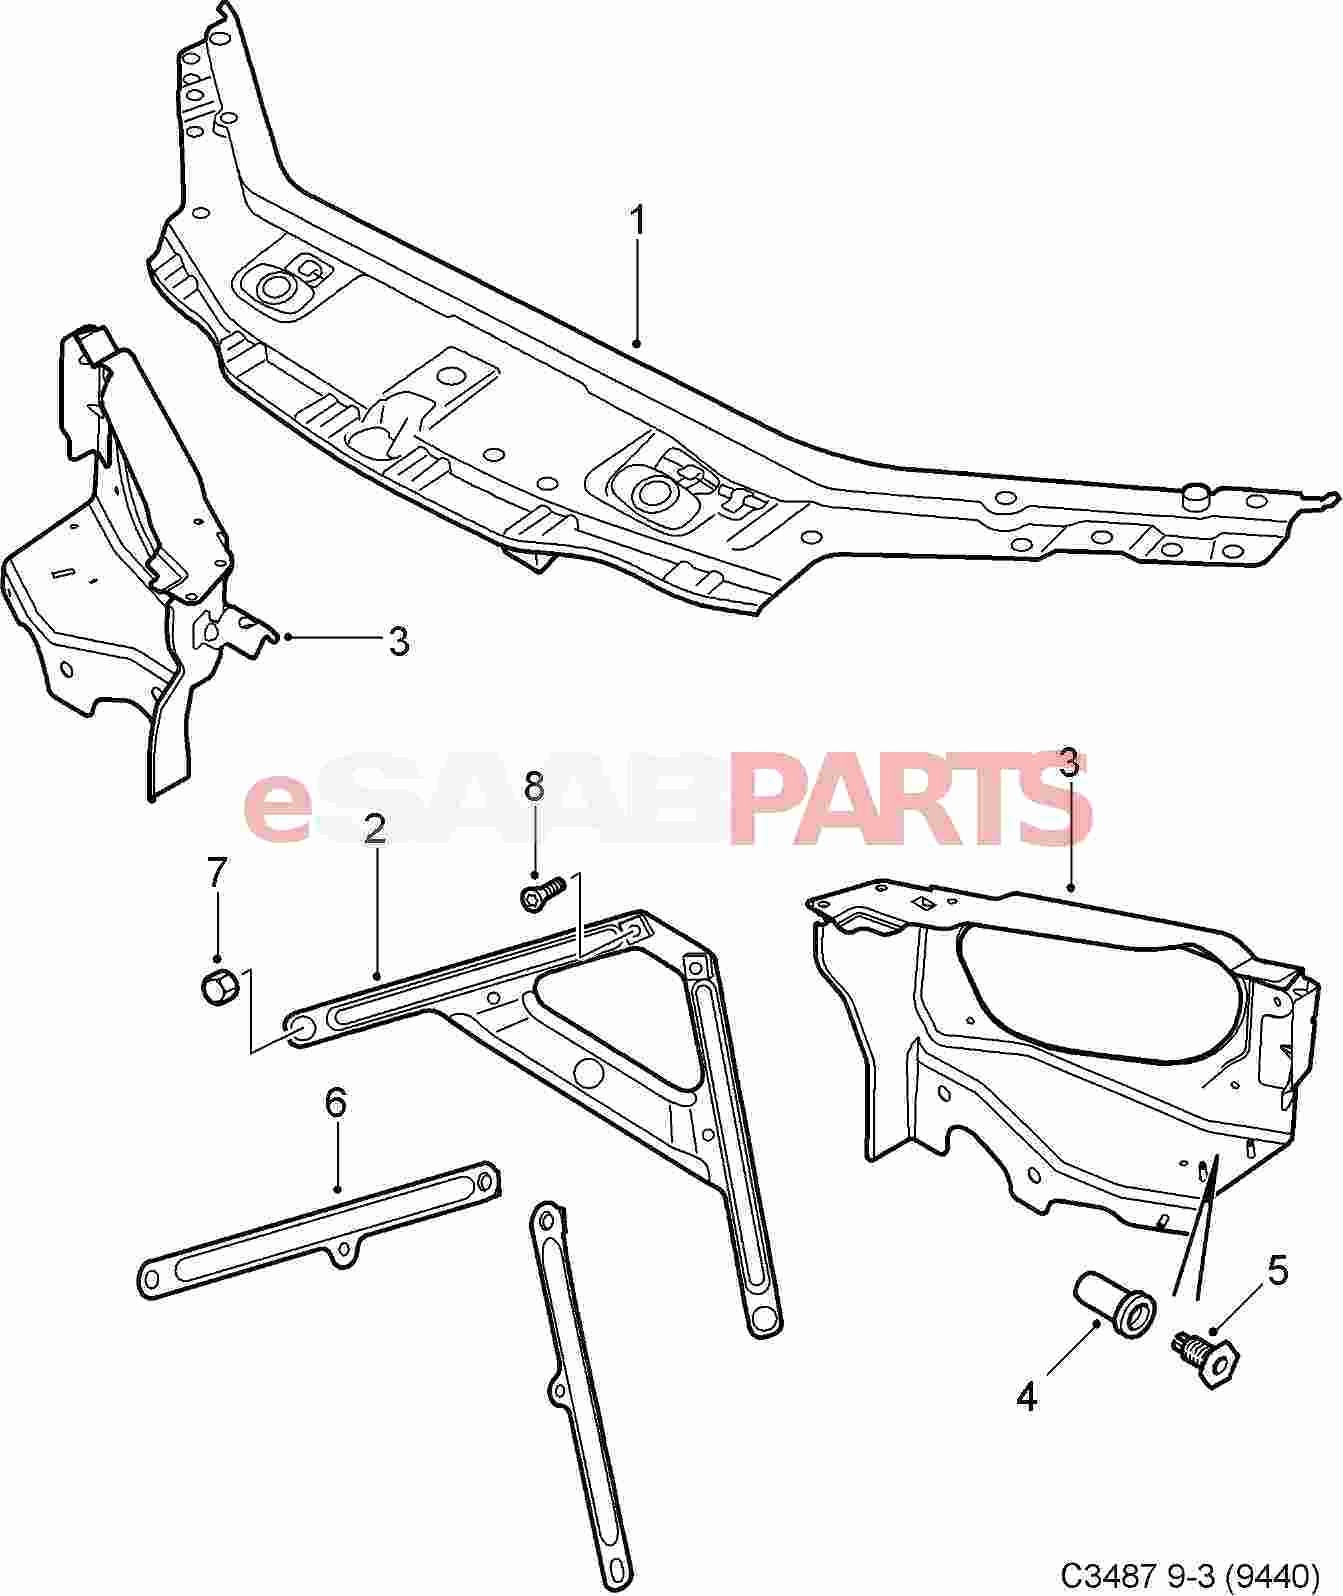 Car Body Panel Diagram Car Exterior Body Parts Diagram Awesome Esaabparts Saab 9 3 9440 Car Of Car Body Panel Diagram